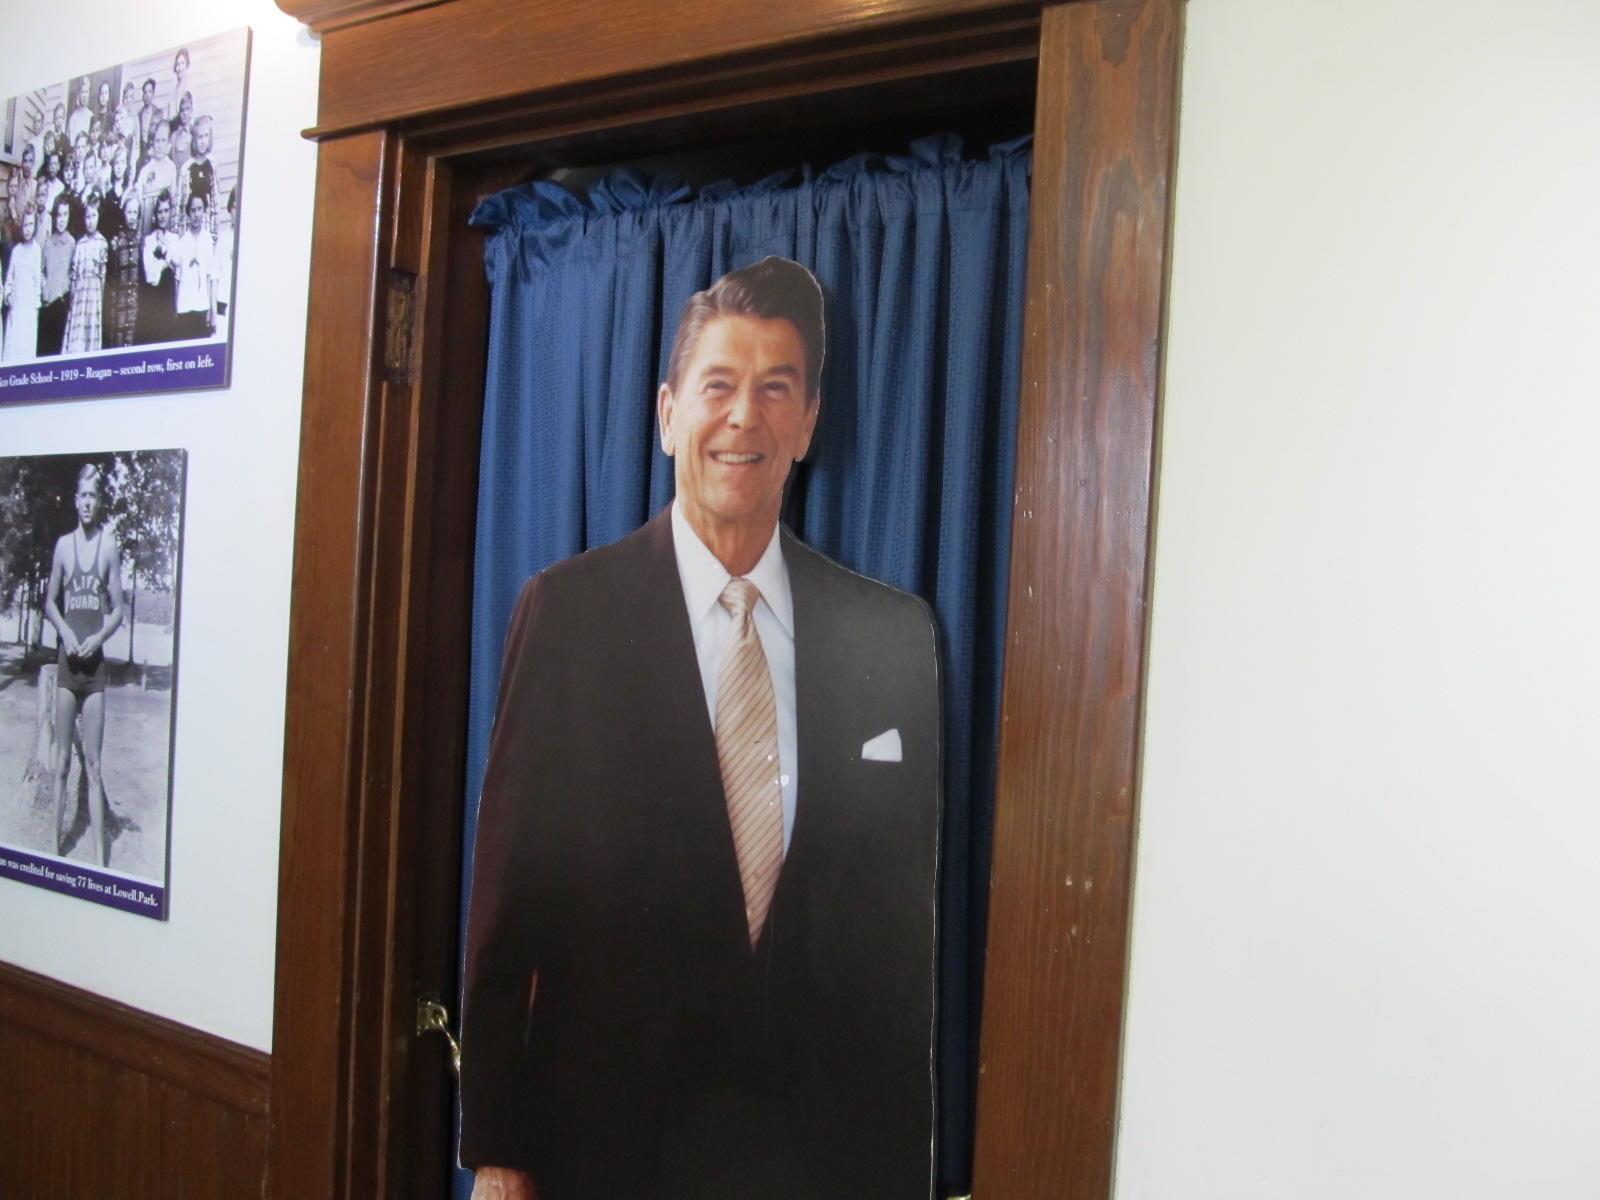 Reagan Boyhood Home Still A Work In Progress But No Longer Falling